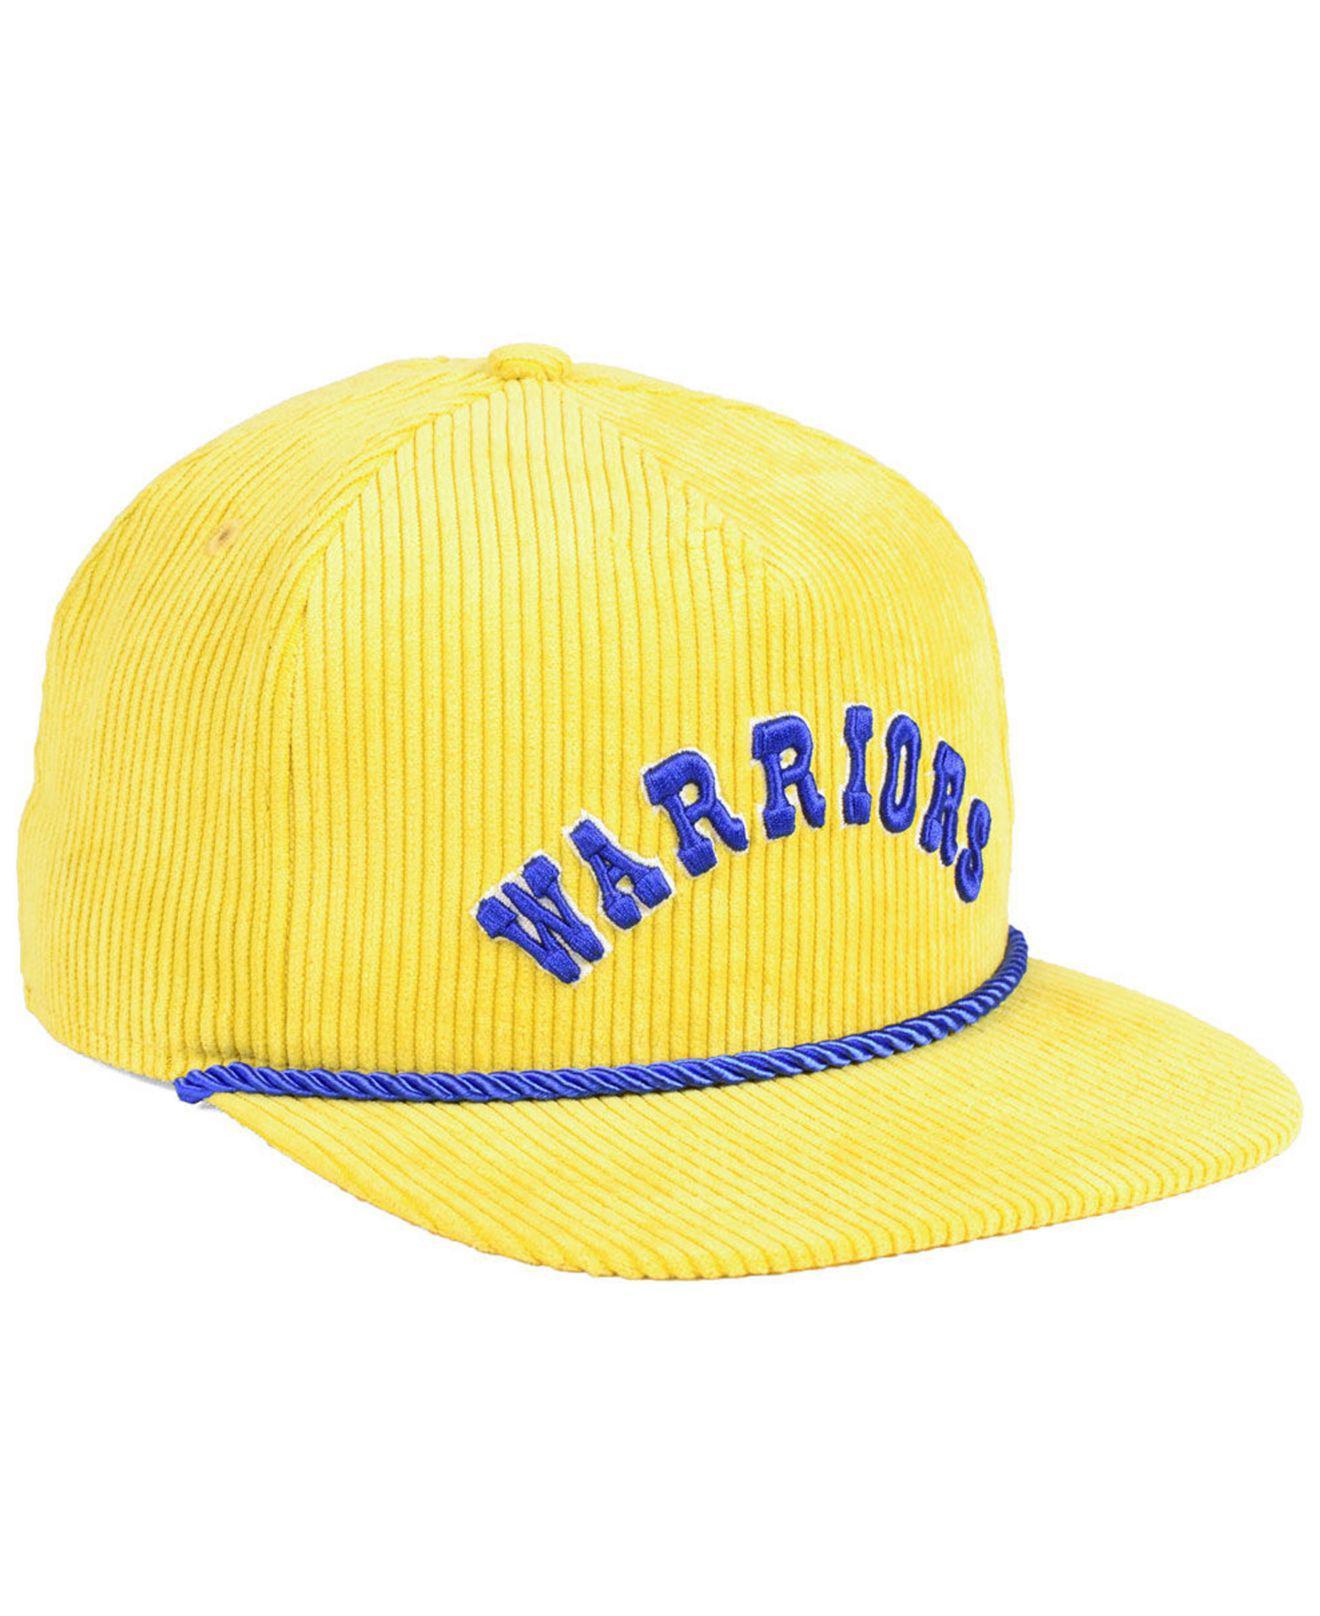 KTZ - Yellow Golden State Warriors Hardwood Classic Nights Cords 9fifty  Snapback Cap for Men -. View fullscreen dd1a8ce65